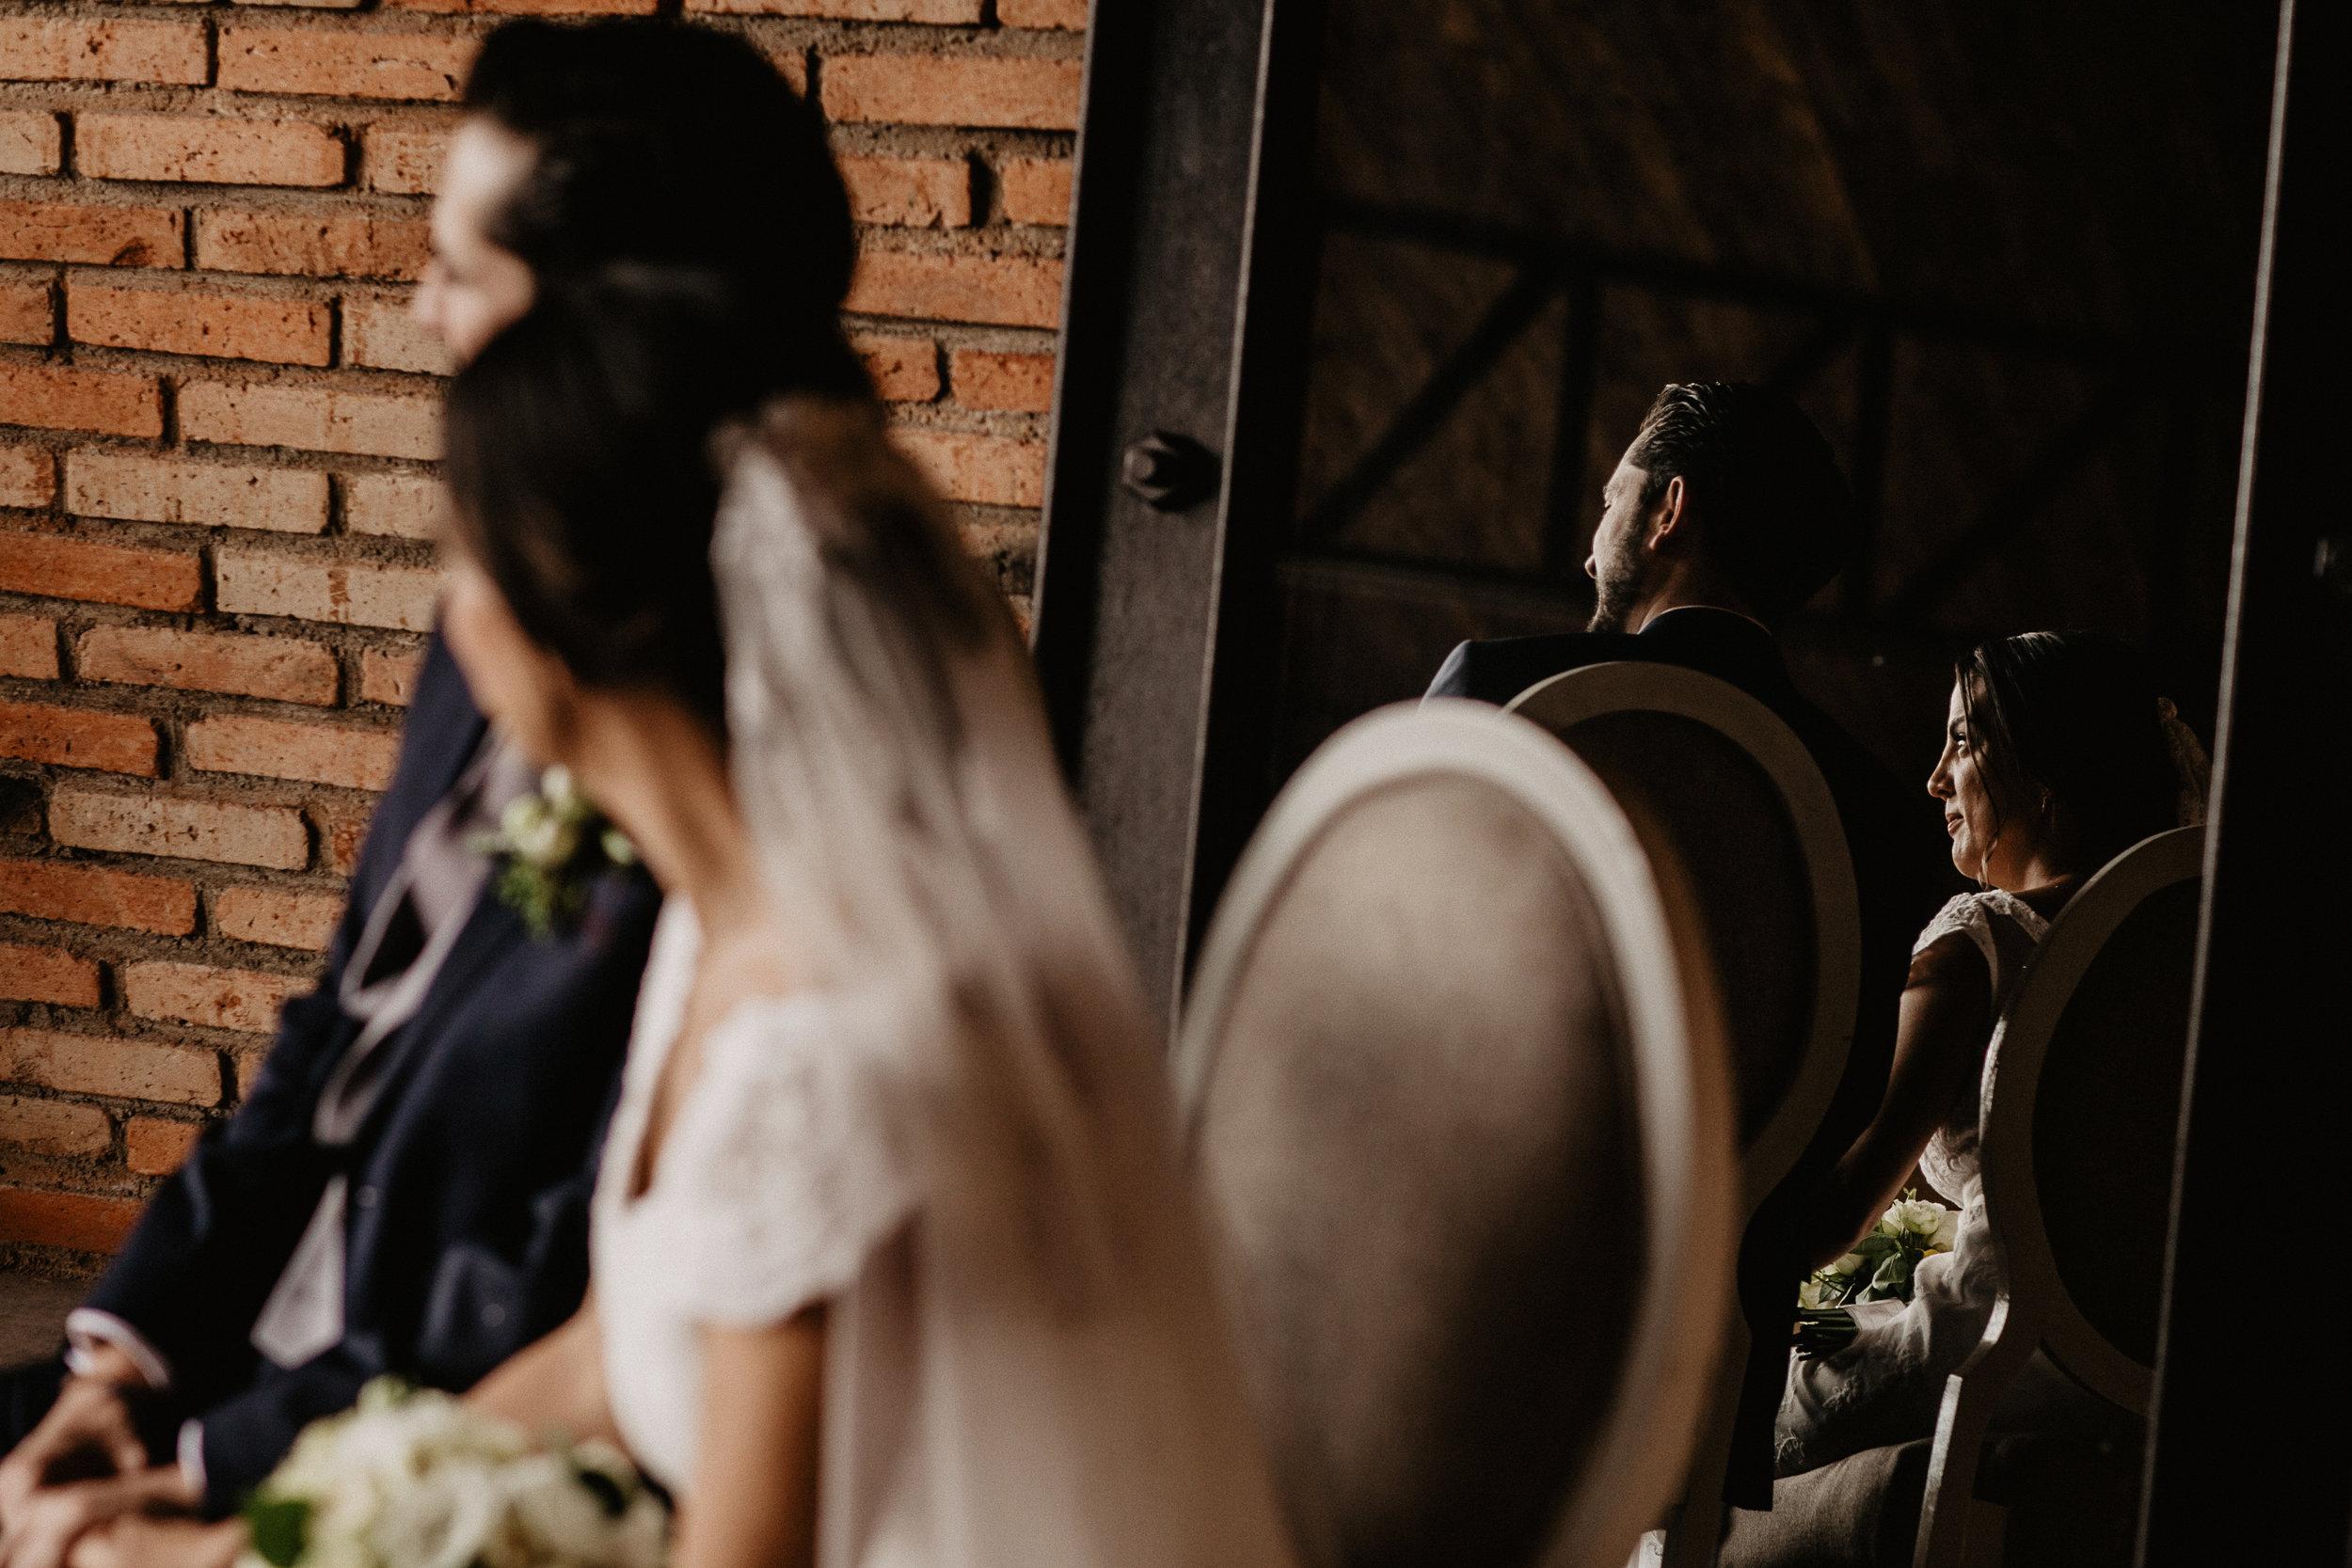 alfonso_flores_destination_wedding_photographer_pau_alonso_621.JPG